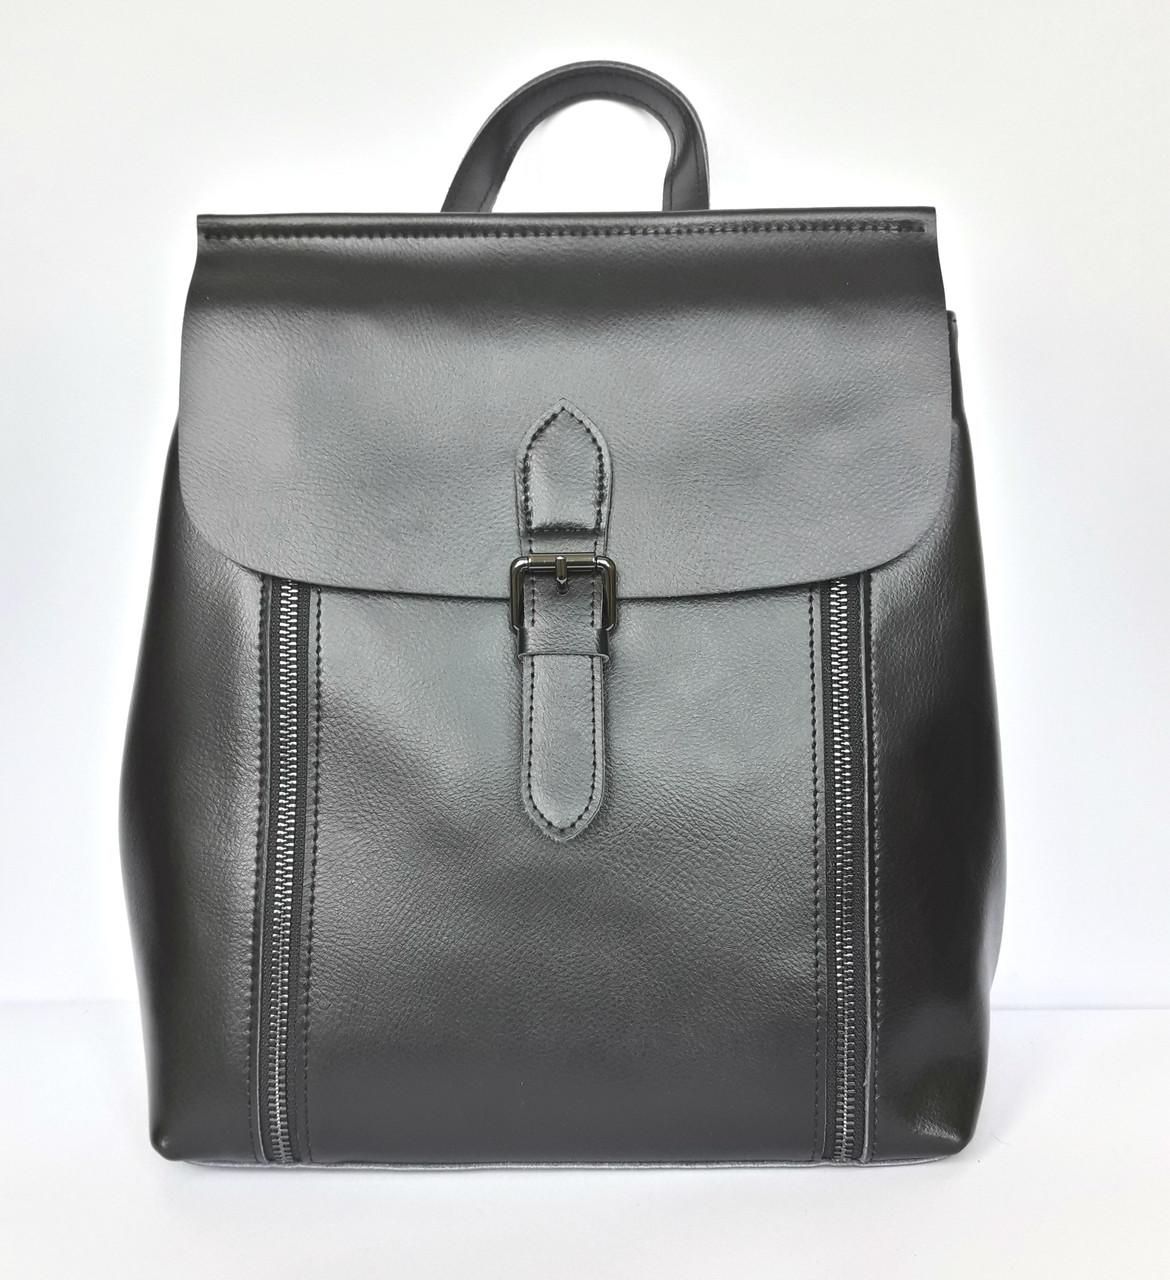 460afffe5950 Рюкзак женский Philipp 8632 кожаный 26х32х12 см Черный (20181116V-662)